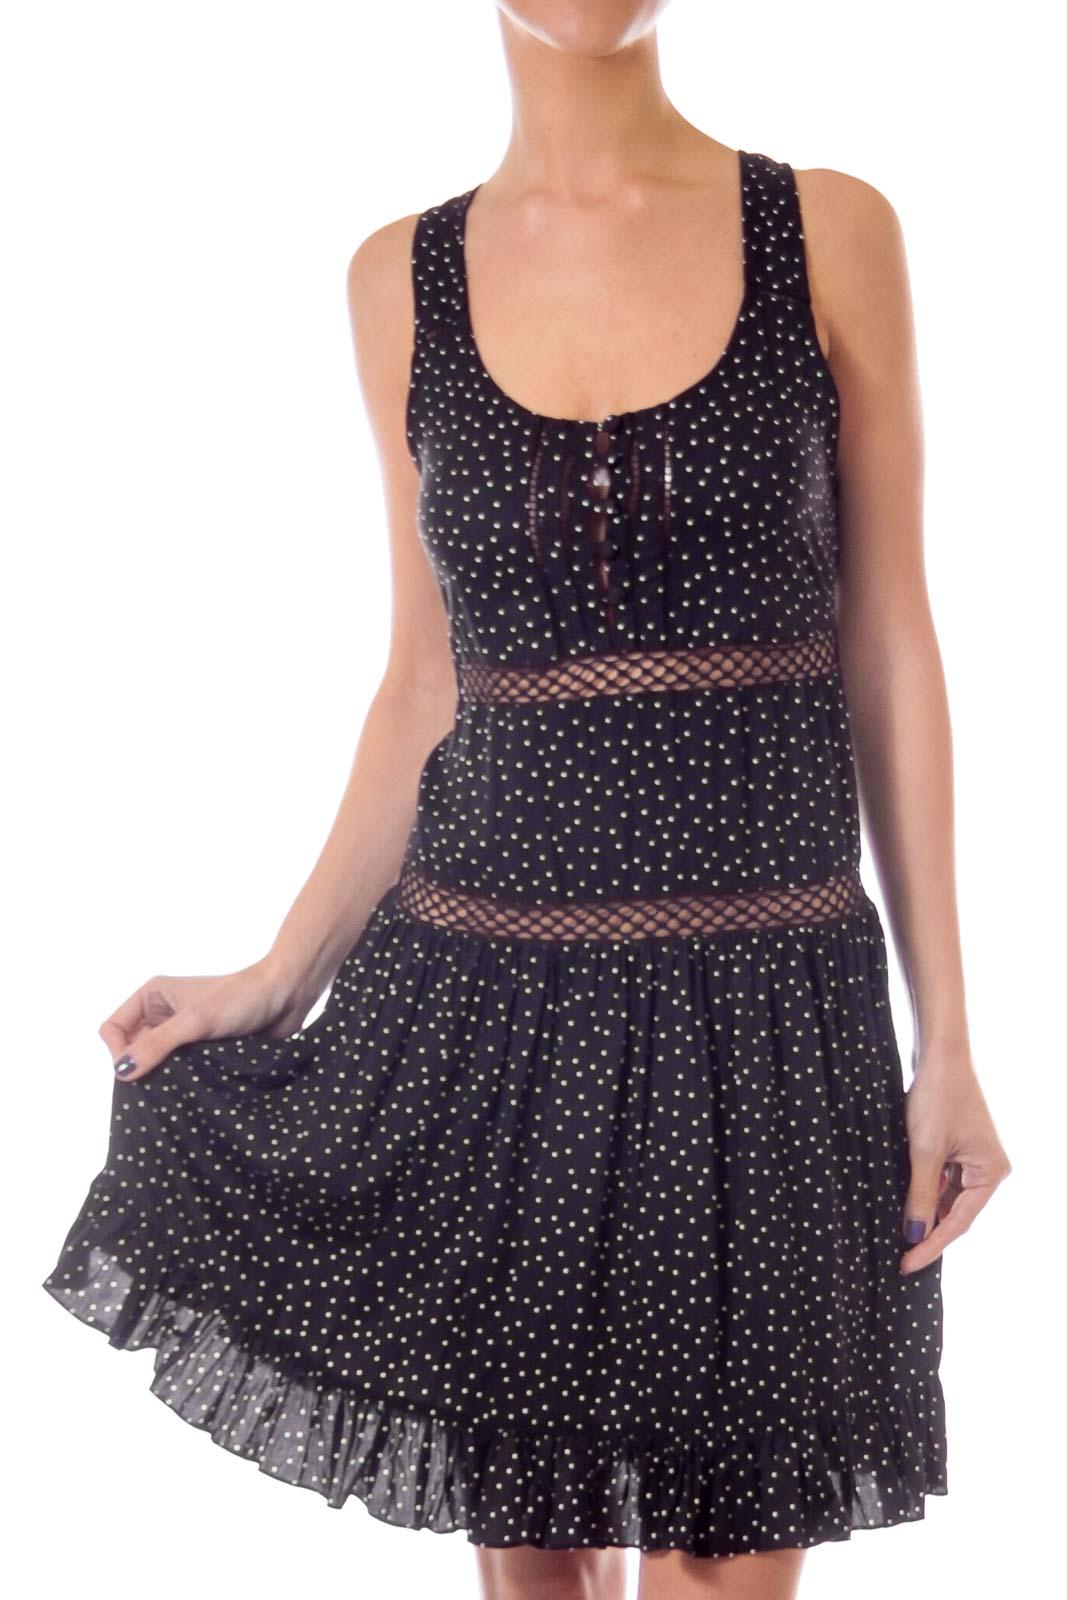 Black Polka Dot A-line Dress Front